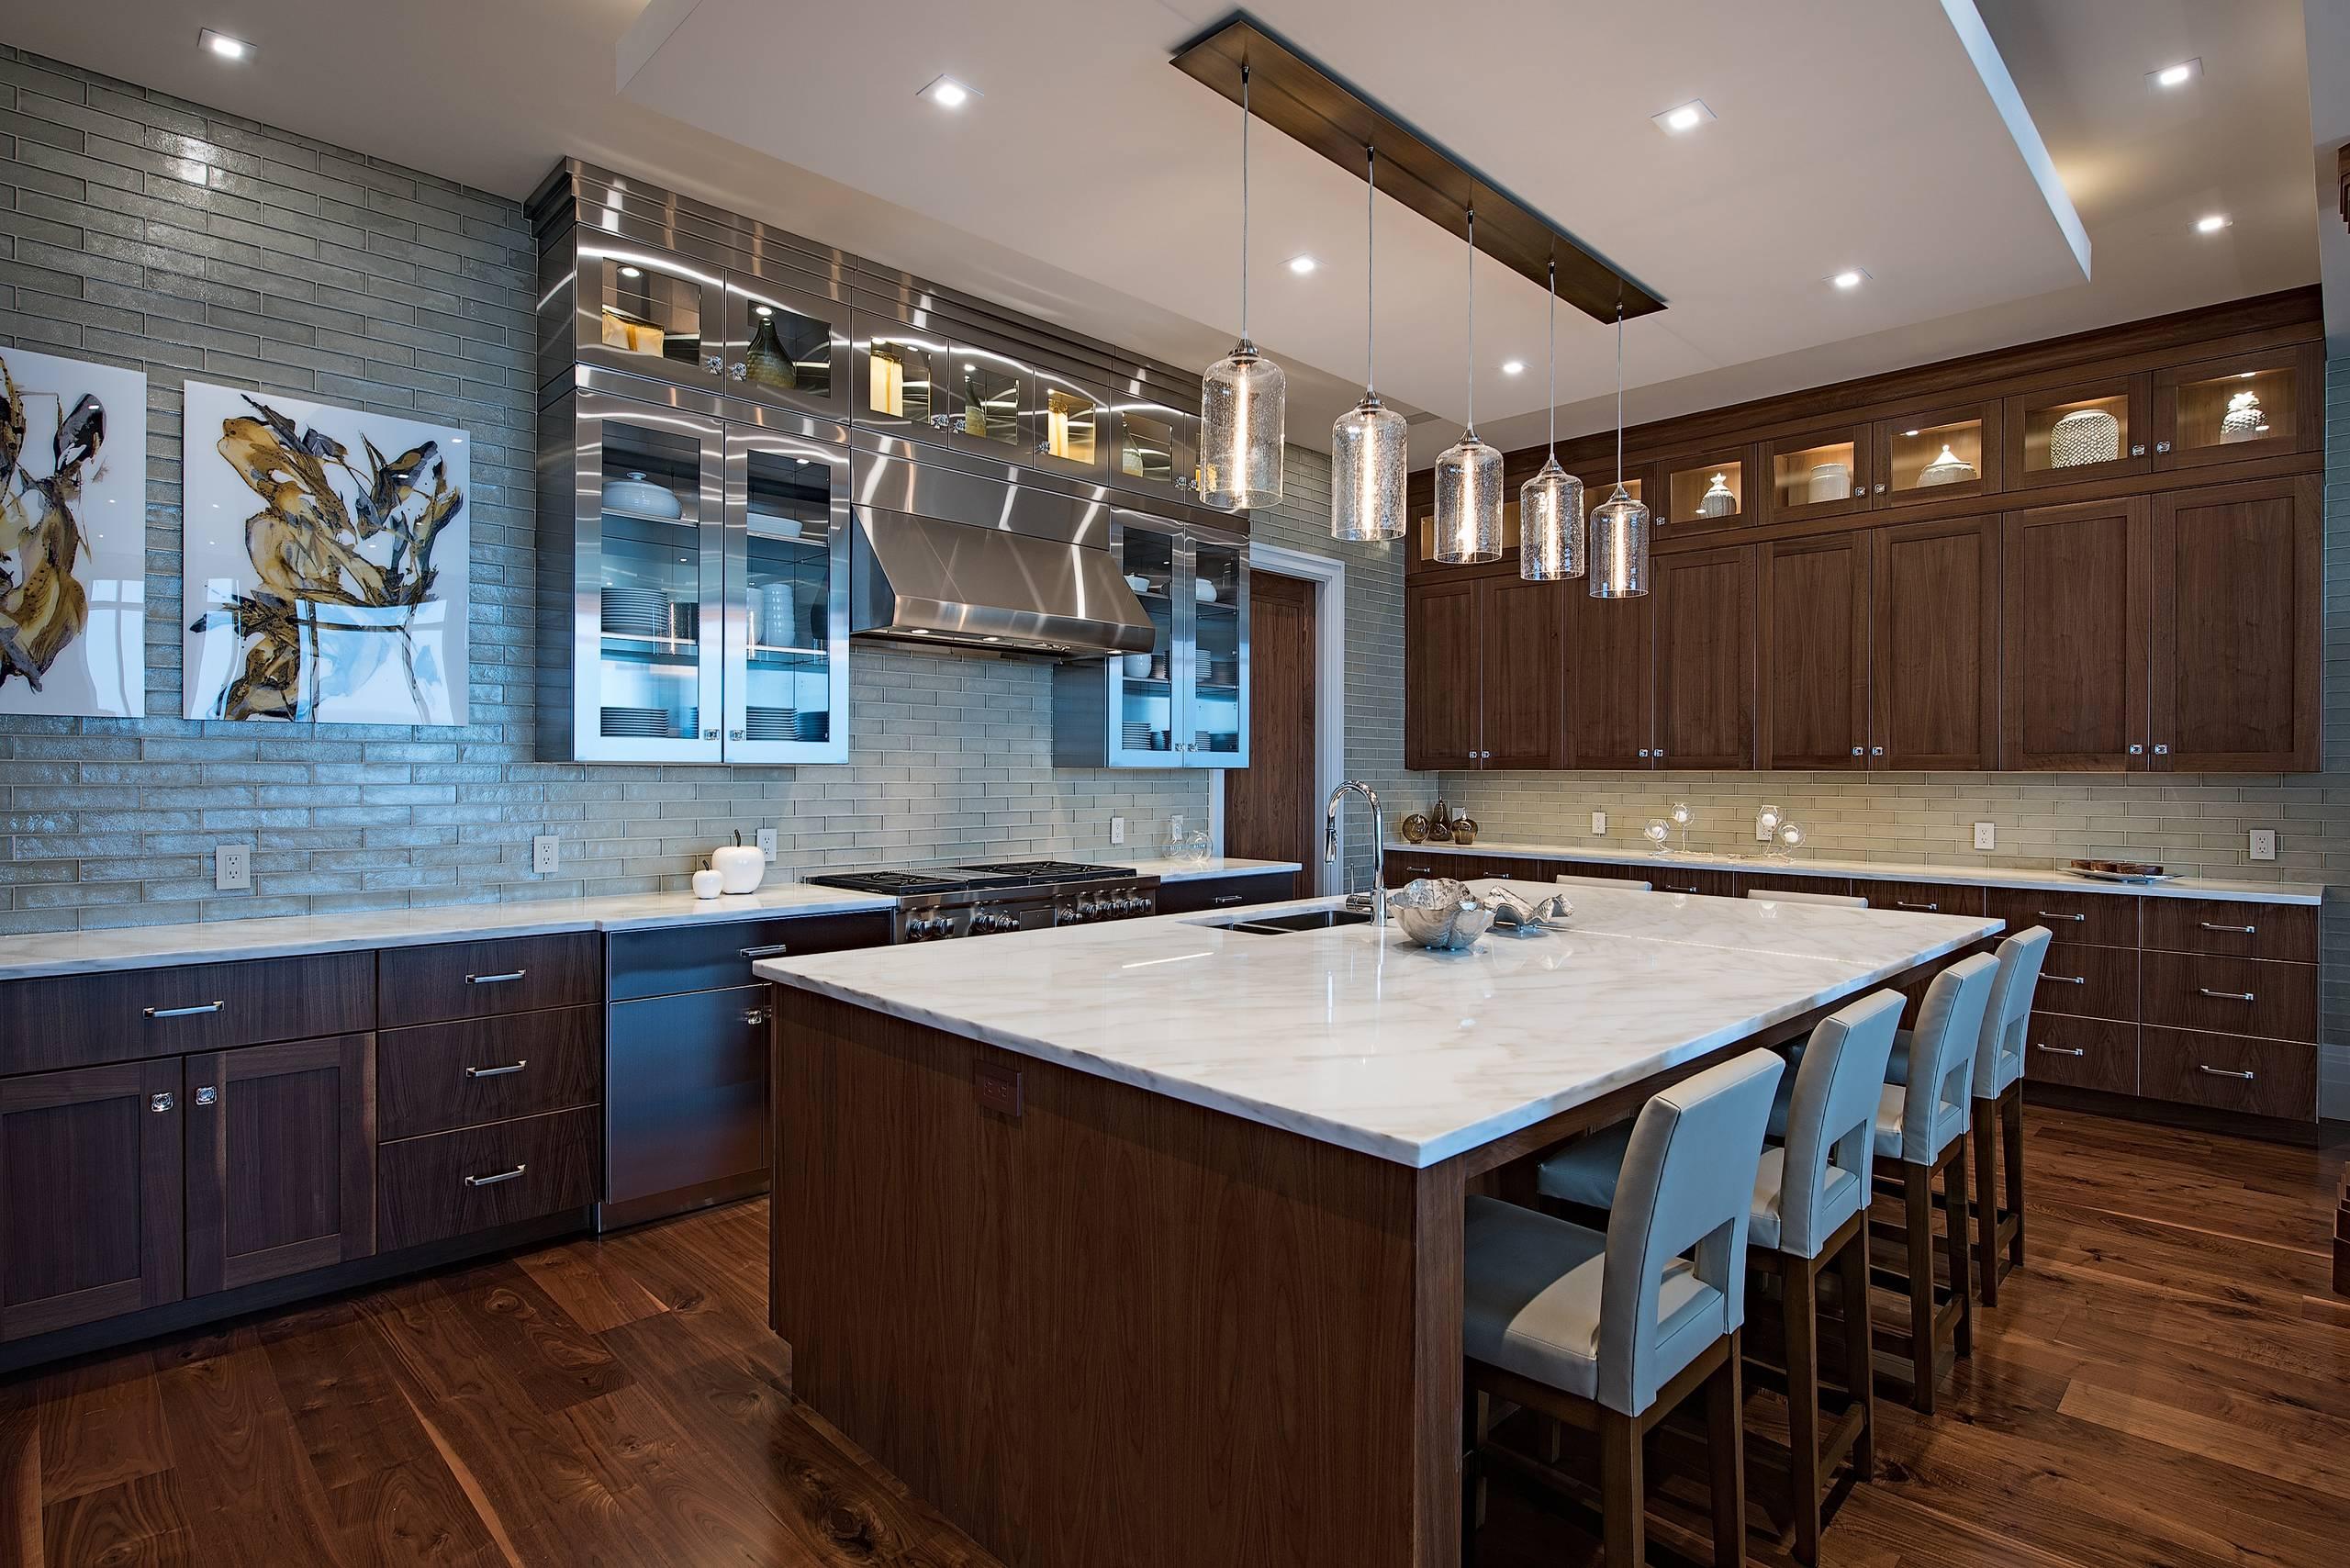 Certified Luxury Builders - 41 West - Veracruz Penthouse Remodel 2Aqdc